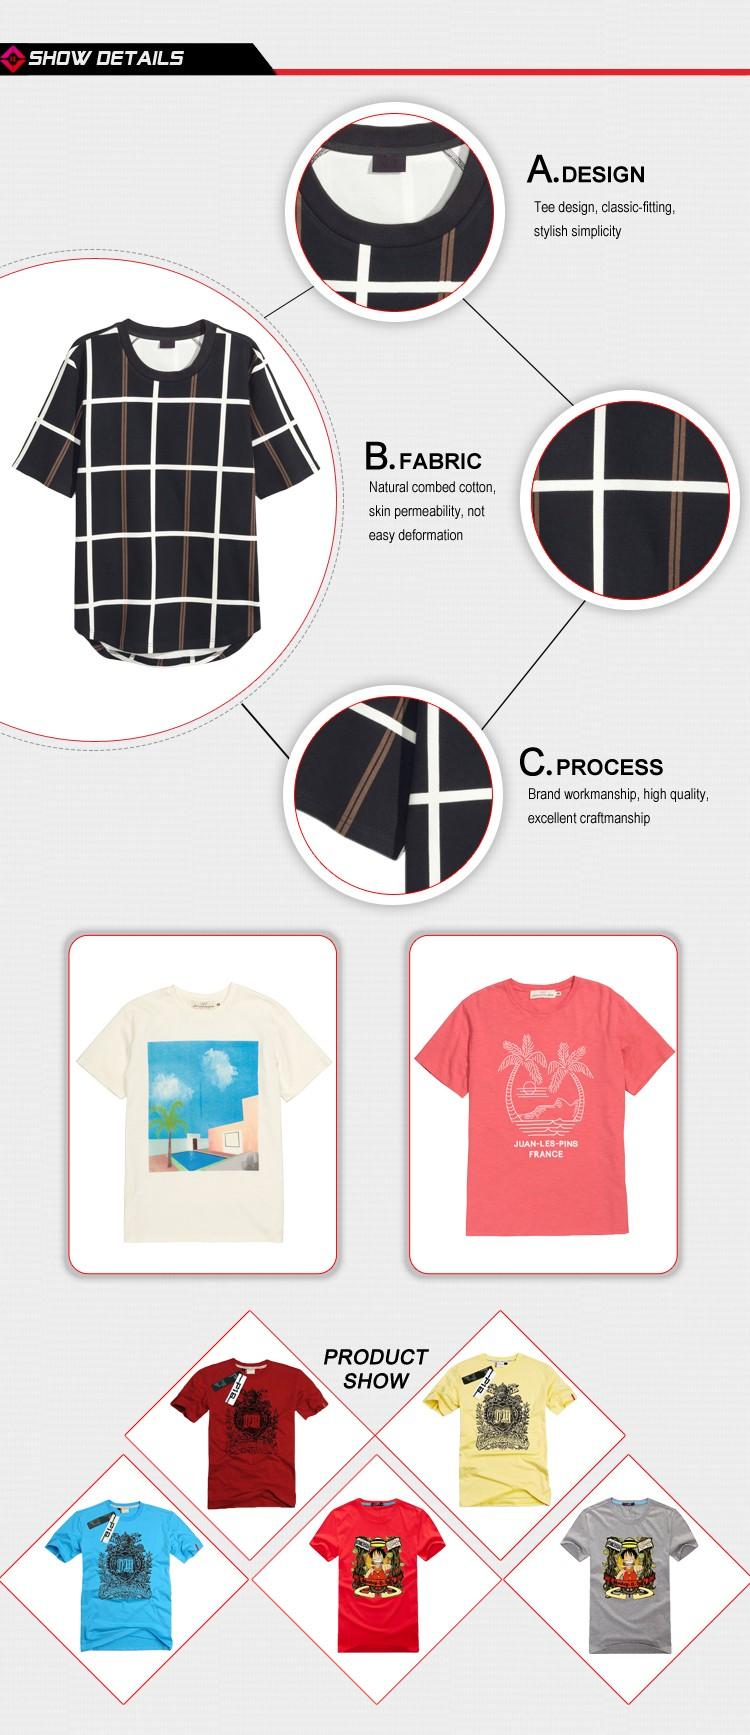 Zebra shirt design - Kid Zebra T Shirt Printing Cute Couple T Shirt Design For Sale